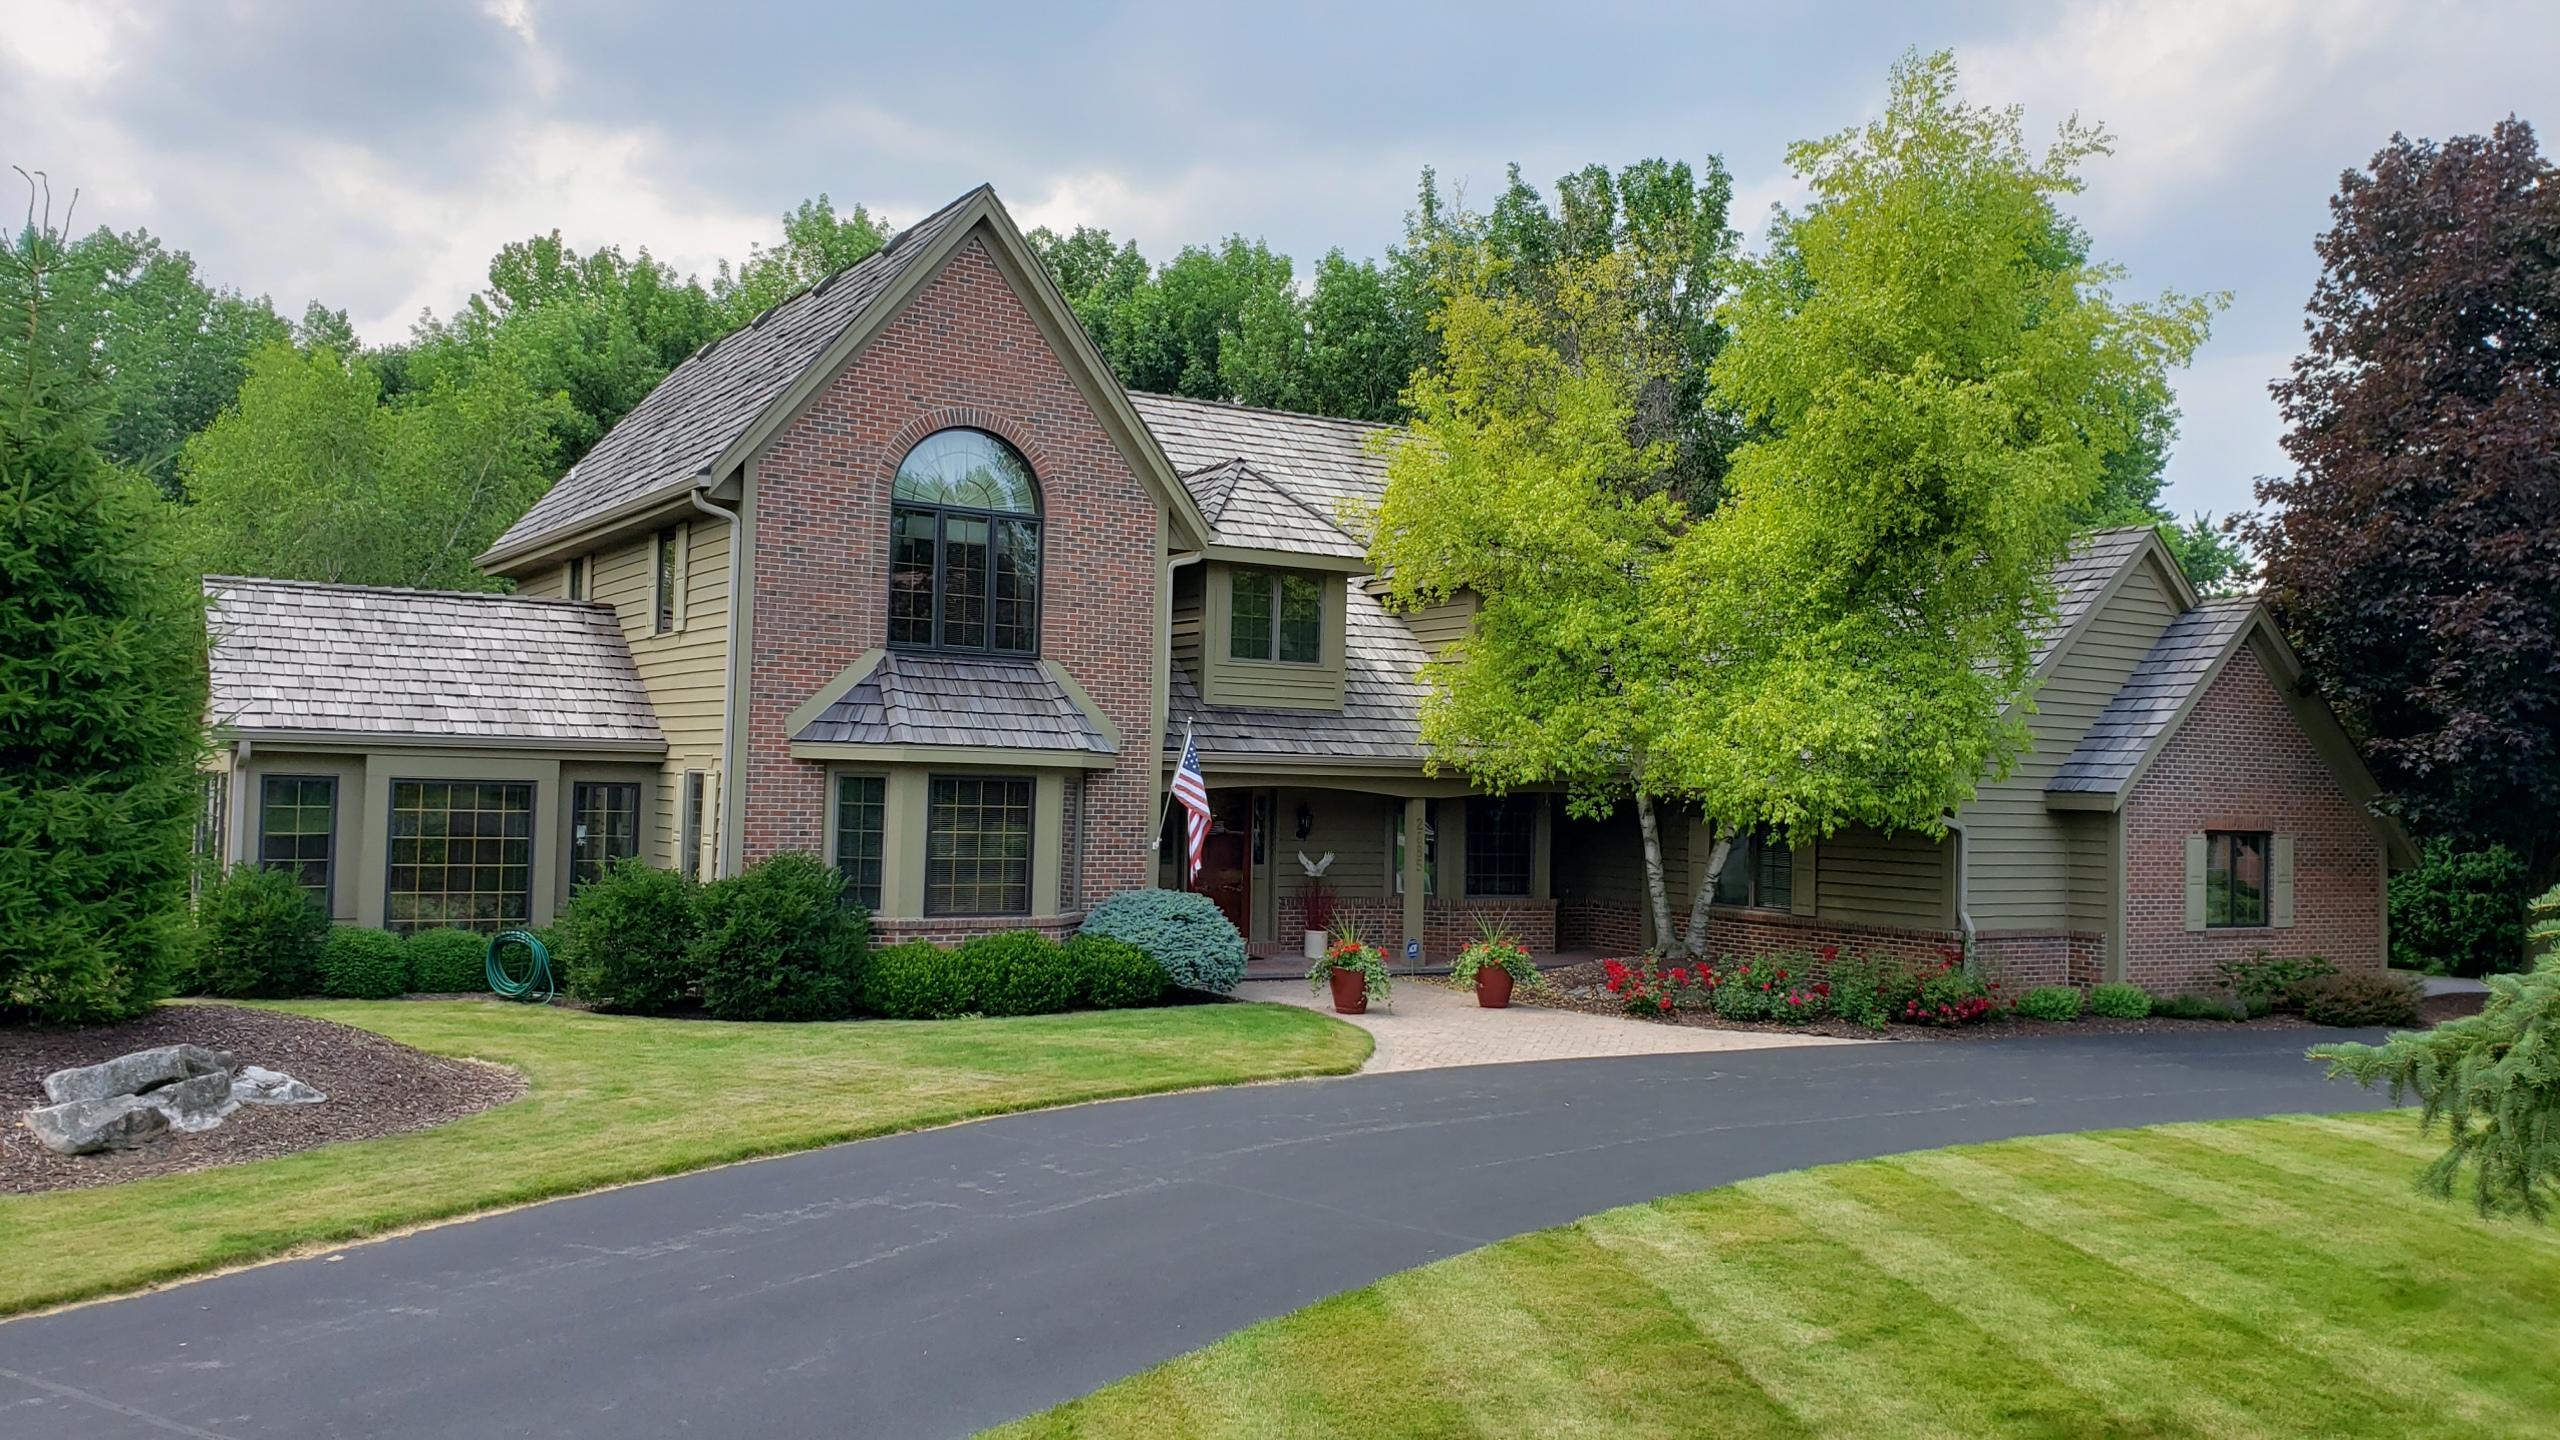 2685 Norman Dr, Brookfield, Wisconsin 53045, 4 Bedrooms Bedrooms, ,3 BathroomsBathrooms,Single-Family,For Sale,Norman Dr,1647781